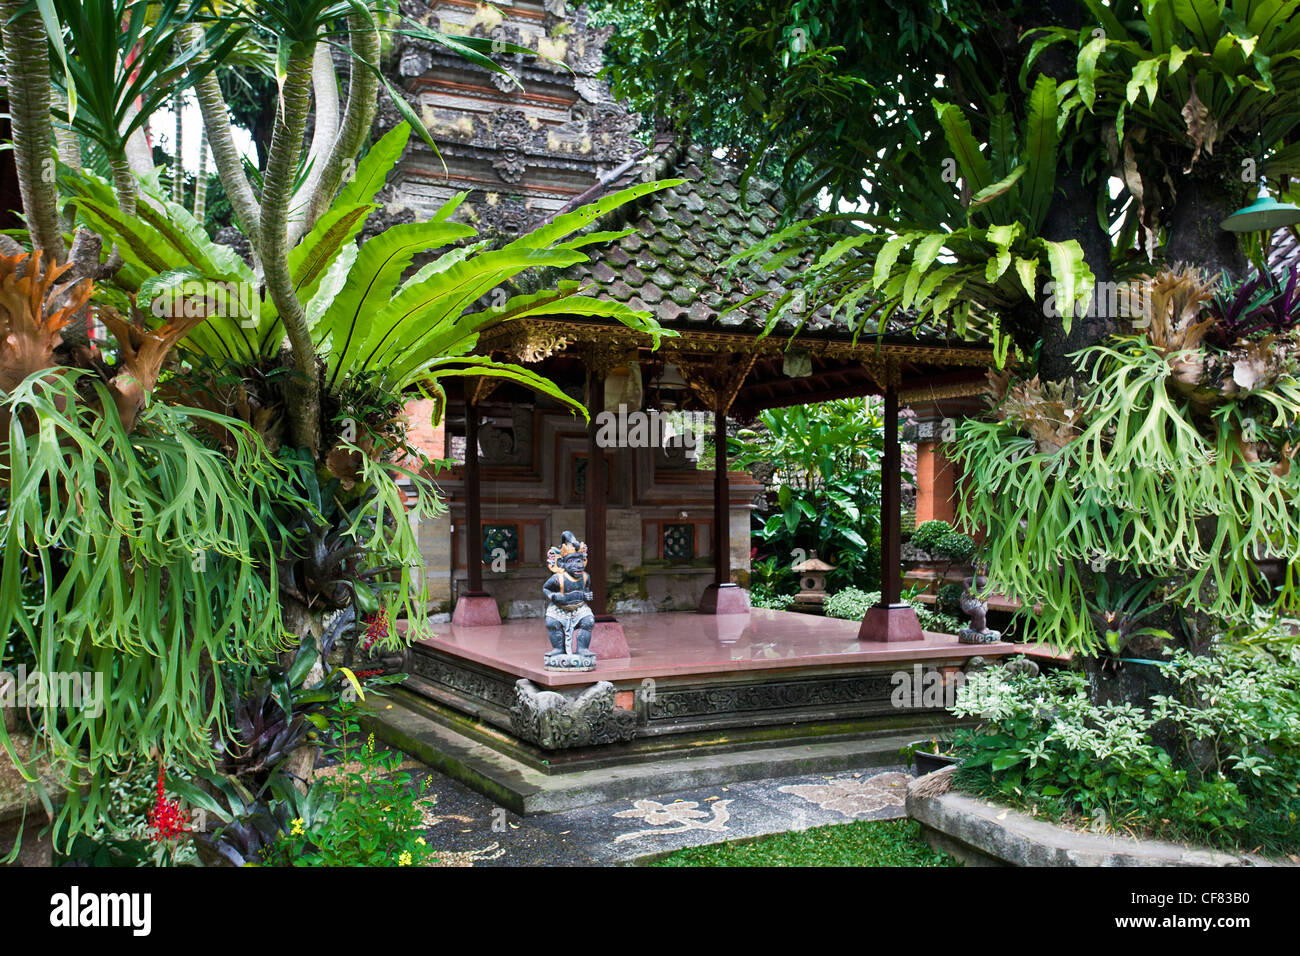 Indonesia asia bali island ubud balinese garden for Balinese garden design